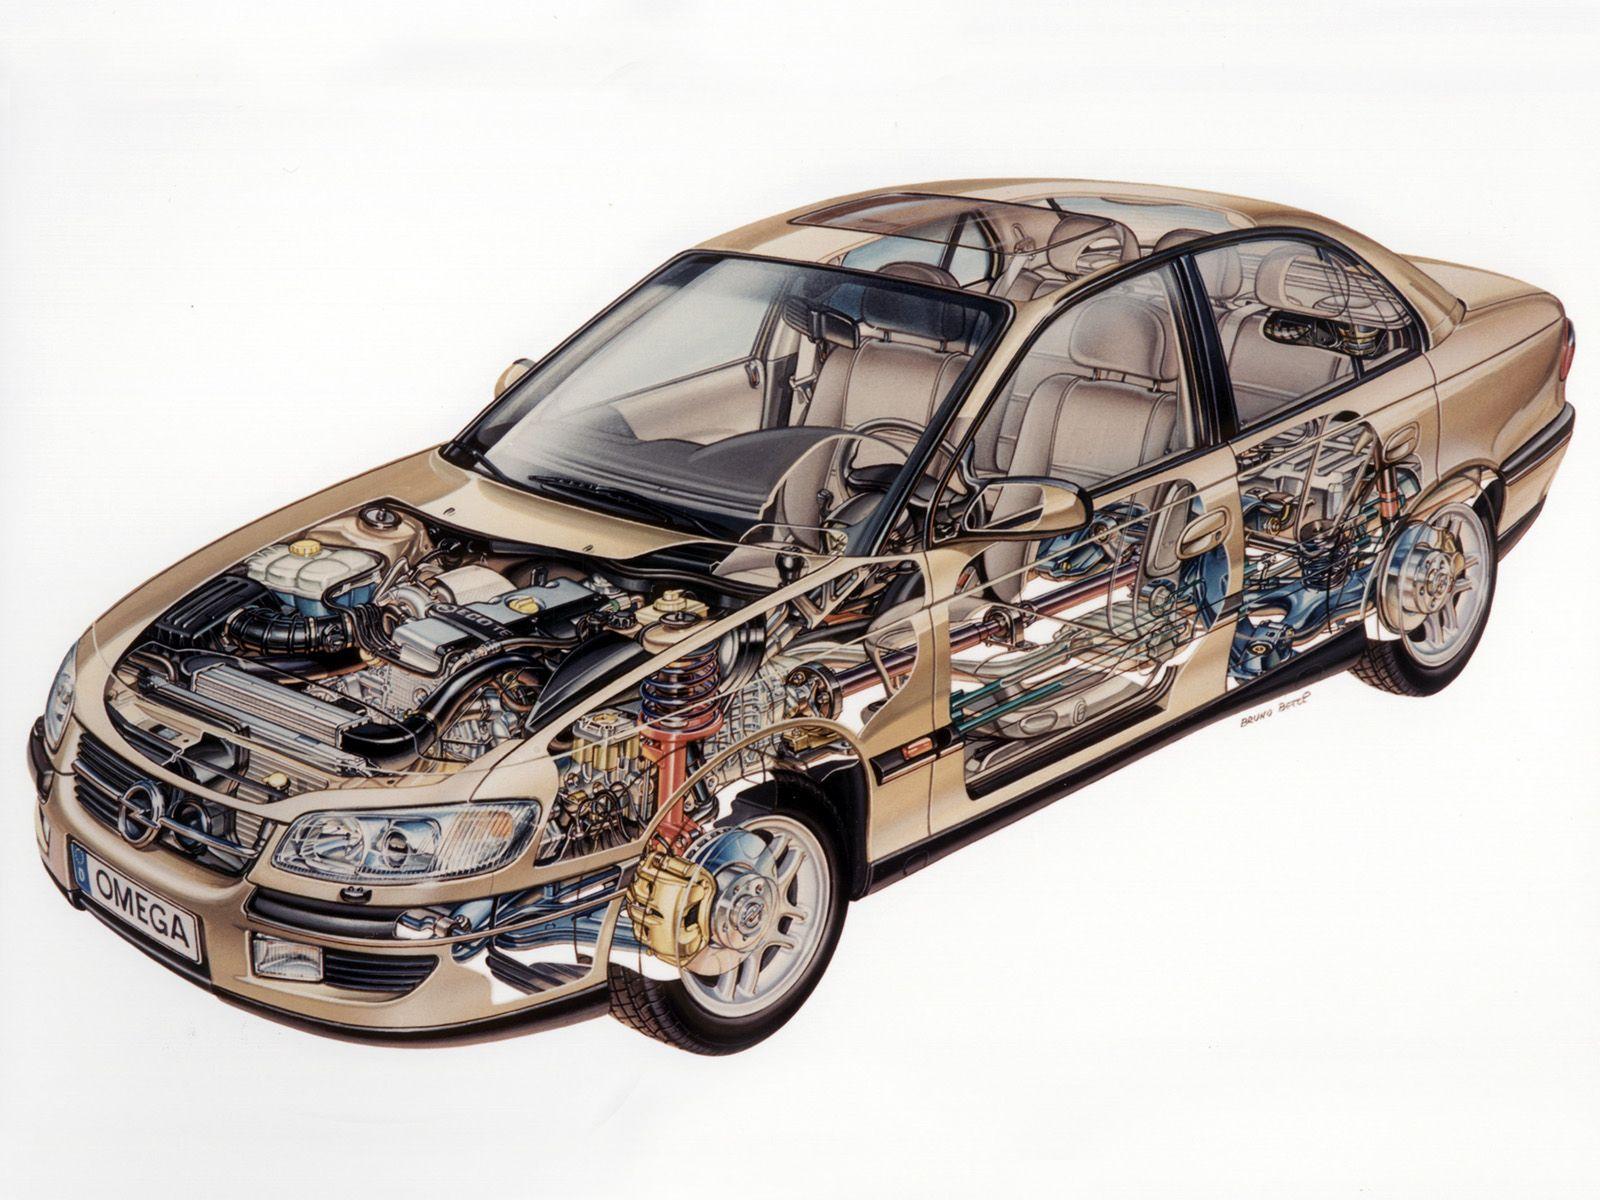 b79e3553f5e 1994-1999 Opel Omega (B) - Illustration by Bruno Betti